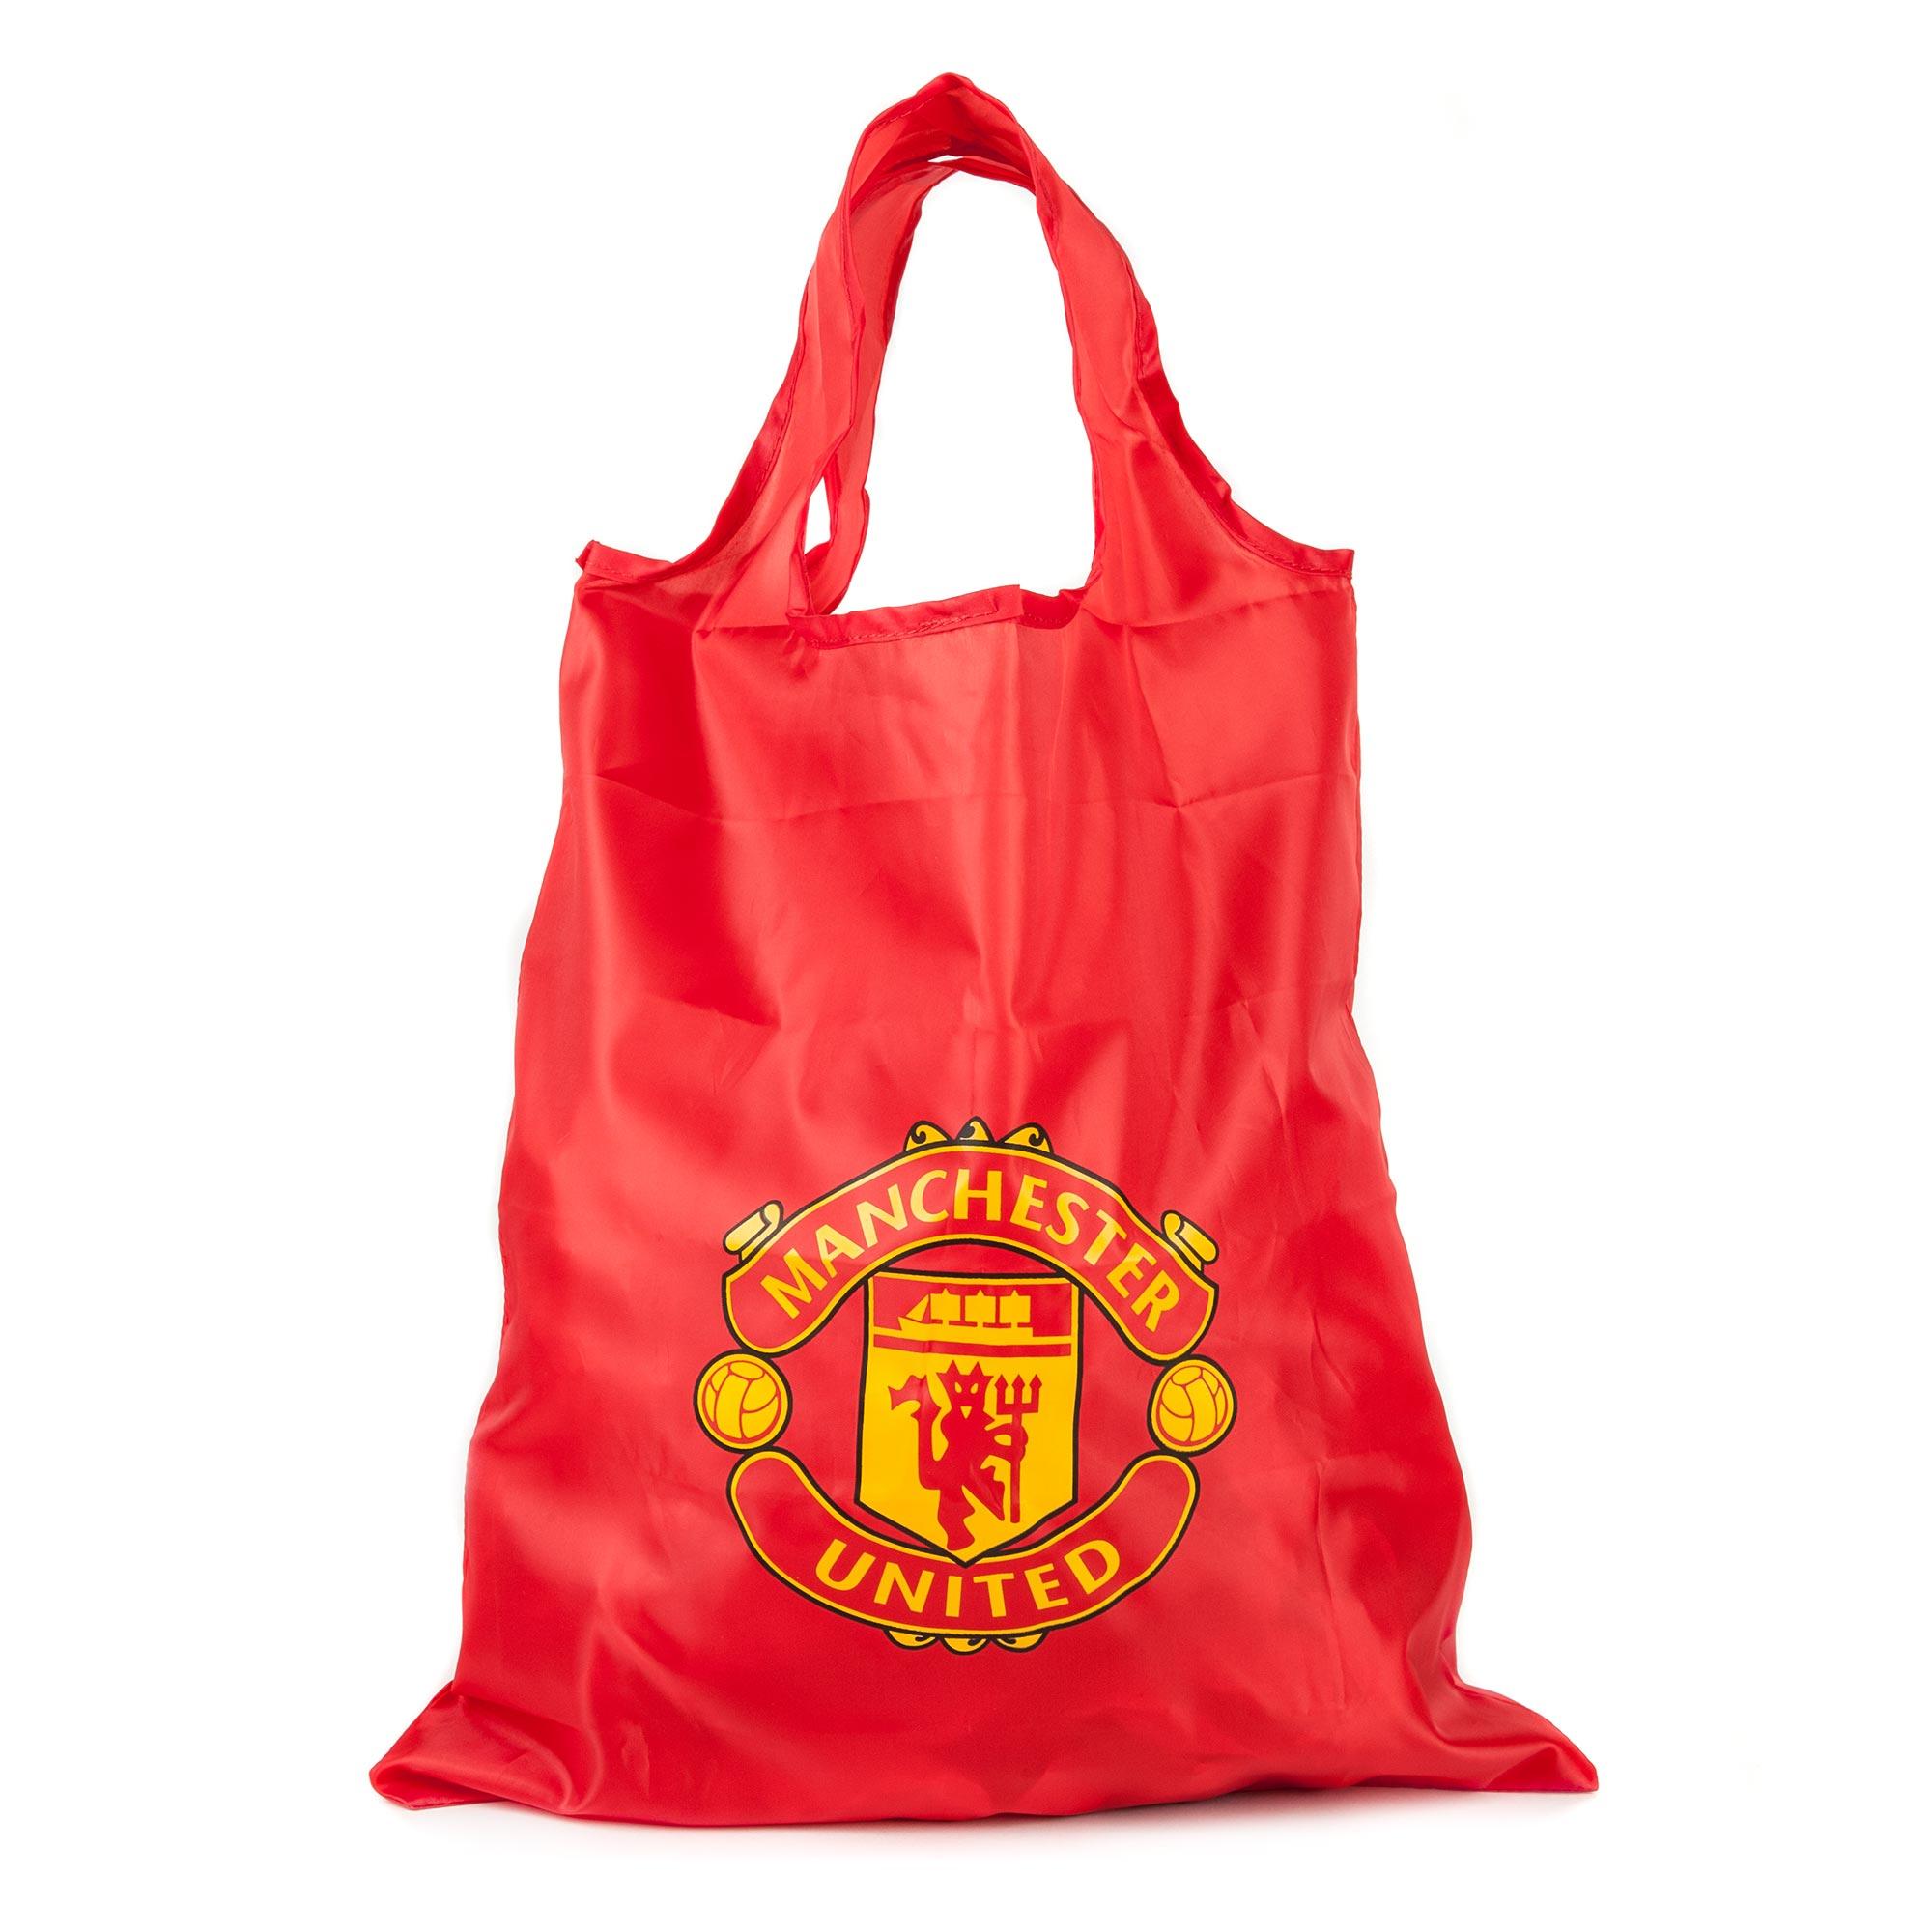 Manchester United Reusable Bag in Bag